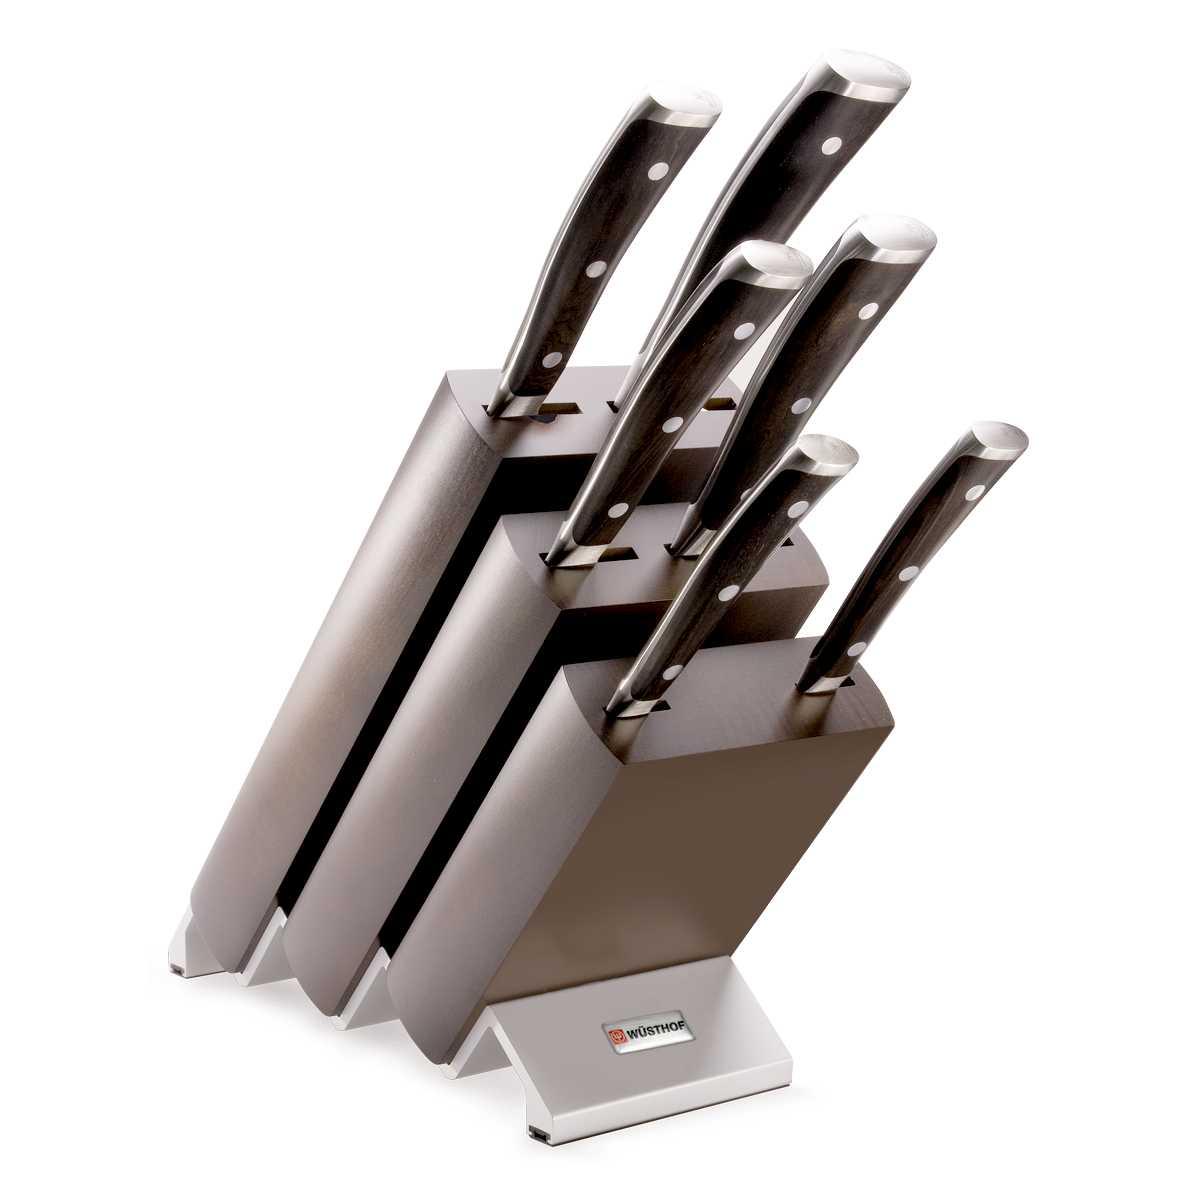 Онлайн каталог PROMENU: Набор ножей с блоком Wuesthof Ikon, коричневый, 7 предметов Wuesthof 9866